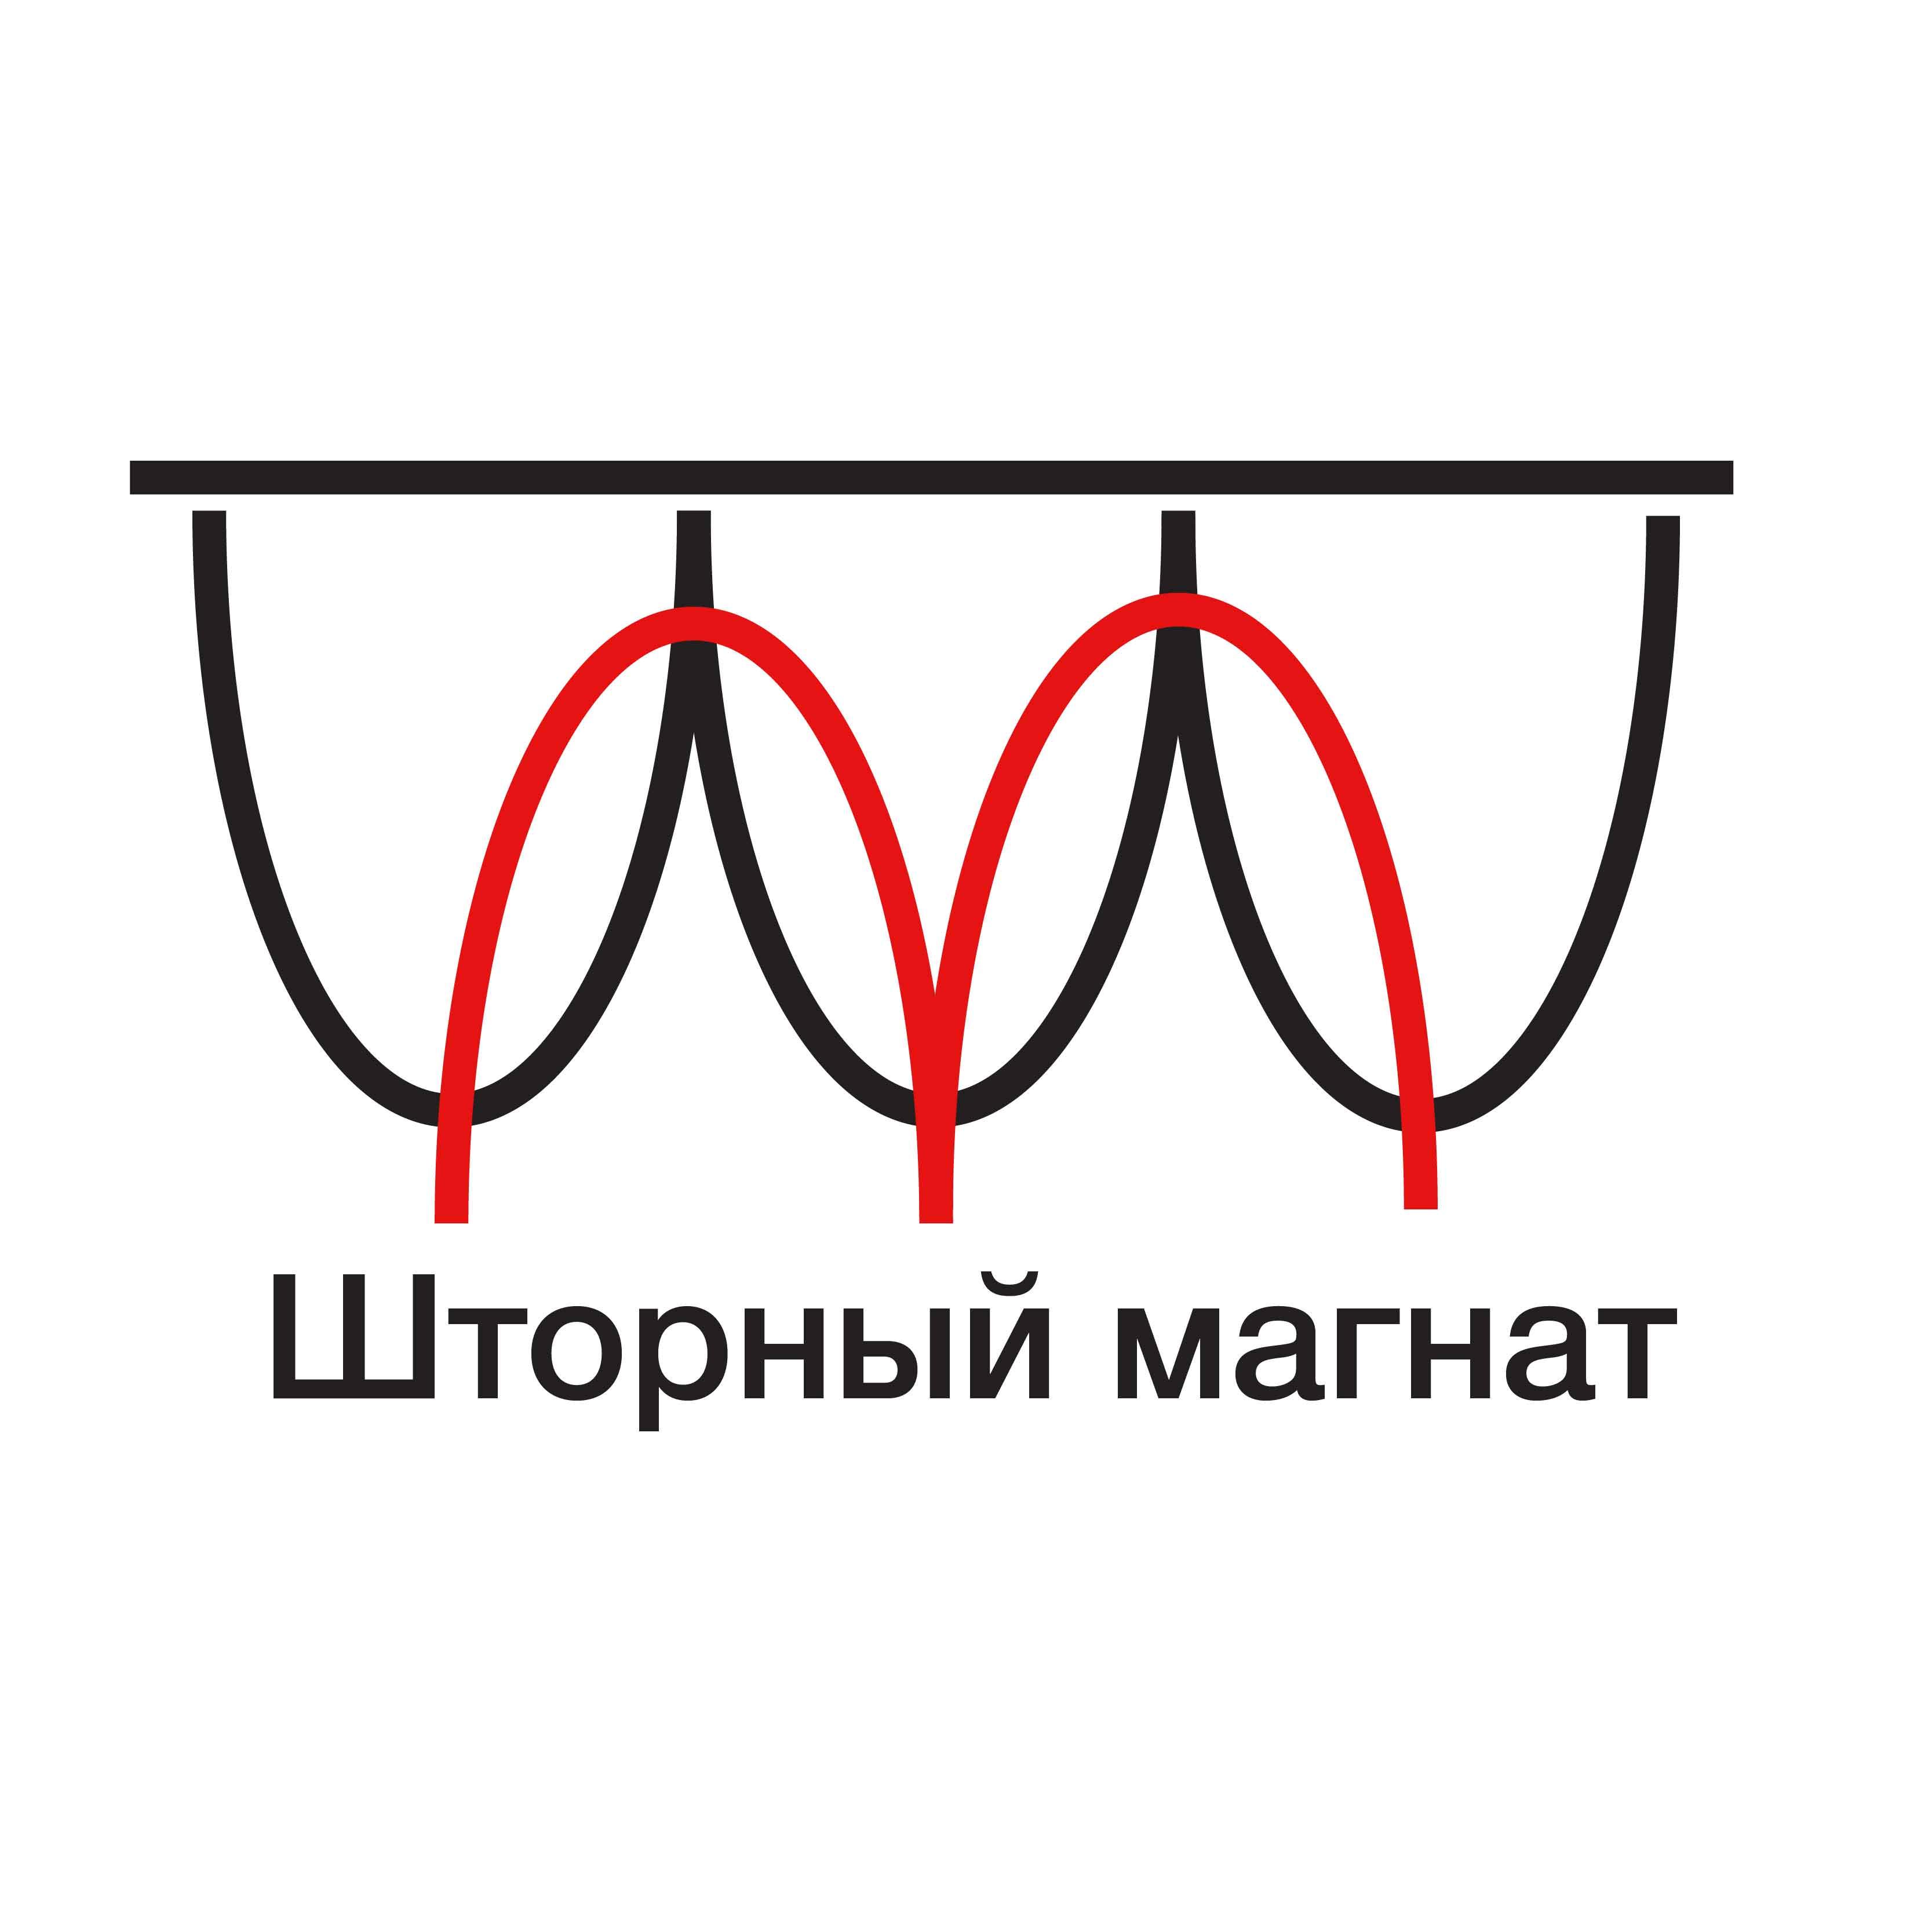 Логотип и фирменный стиль для магазина тканей. фото f_0945cdc12168753e.jpg